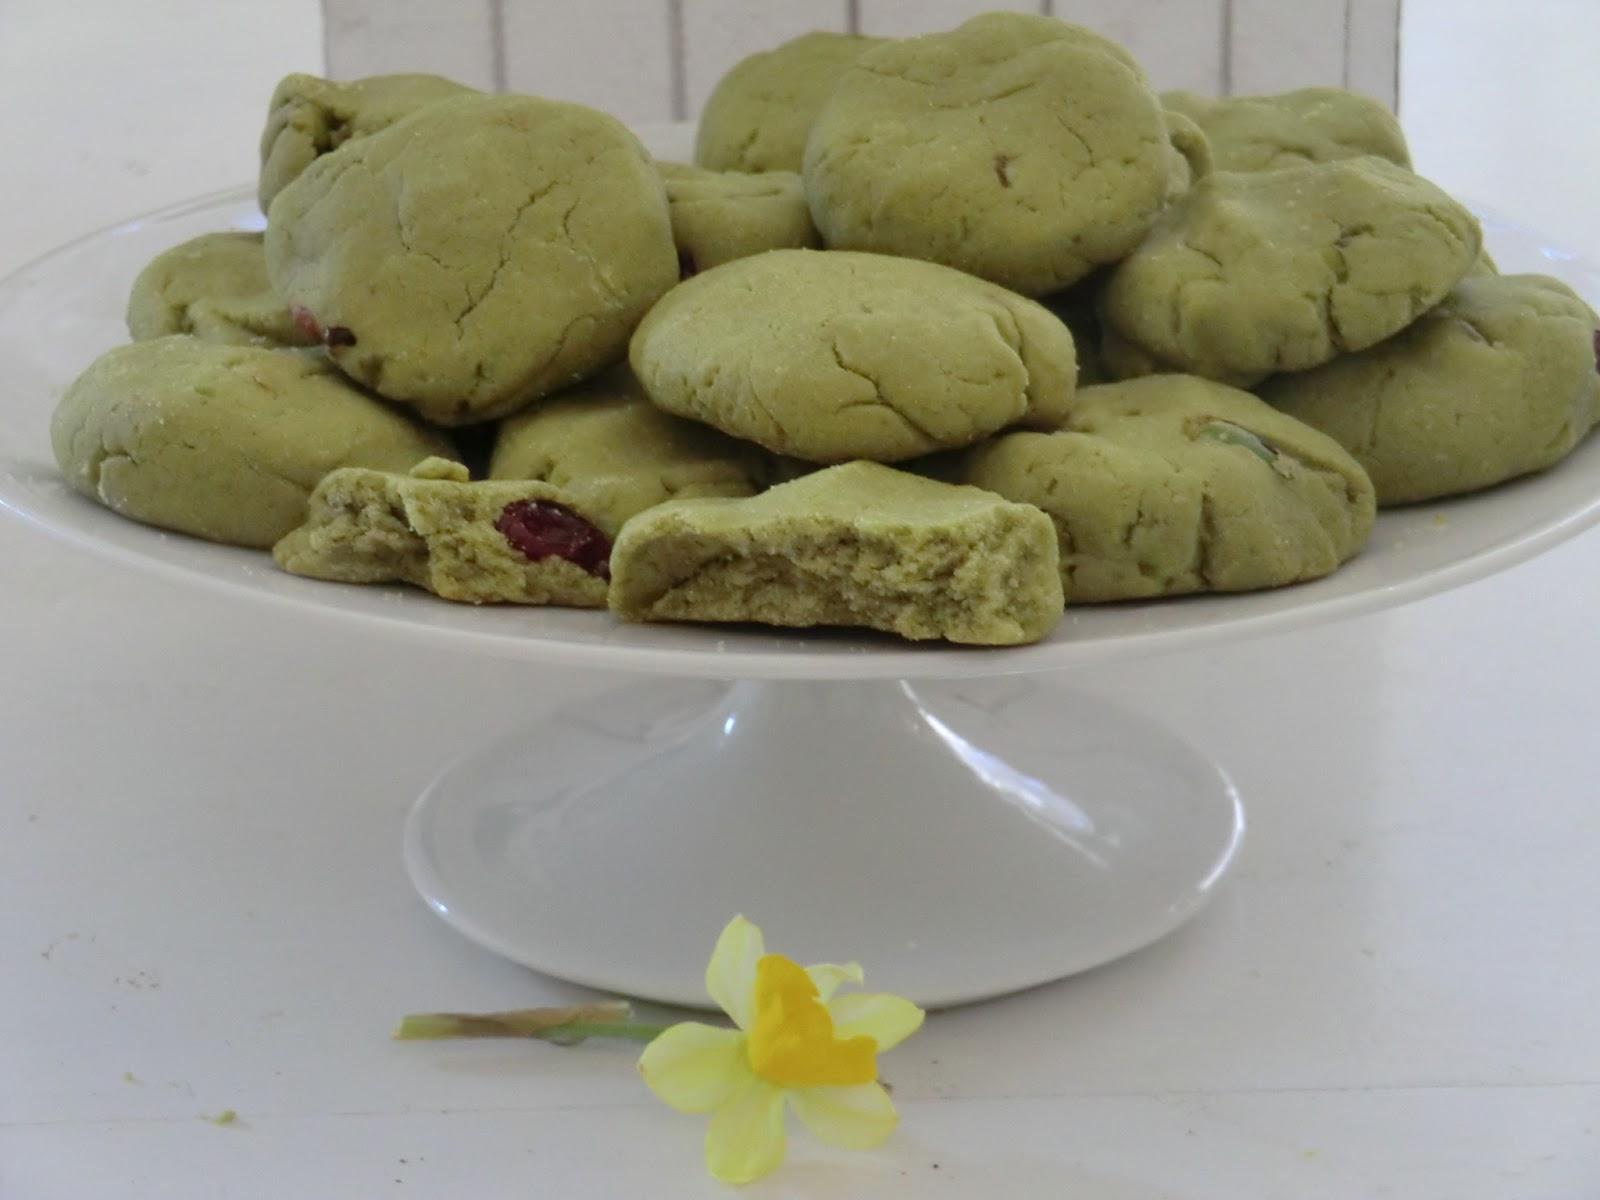 Biscuits Au The Vert Matcha Pistaches Et Cranberries Sans Gluten Ni